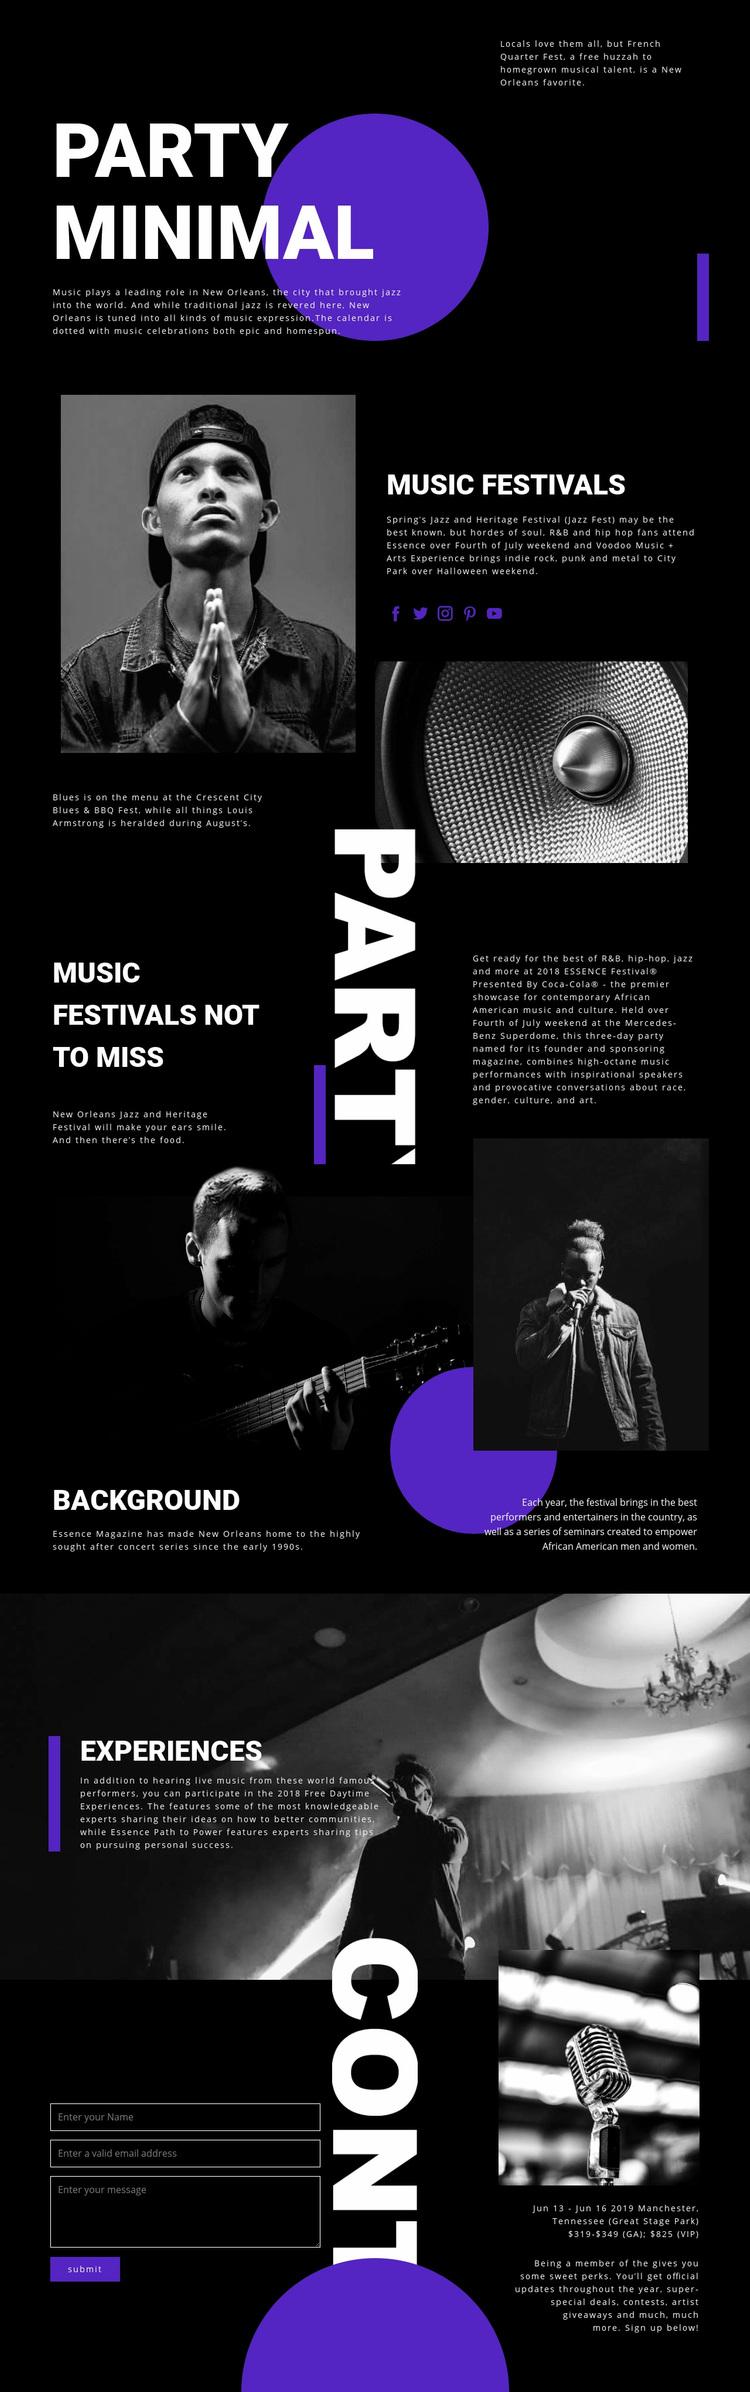 Music Festival Web Page Designer